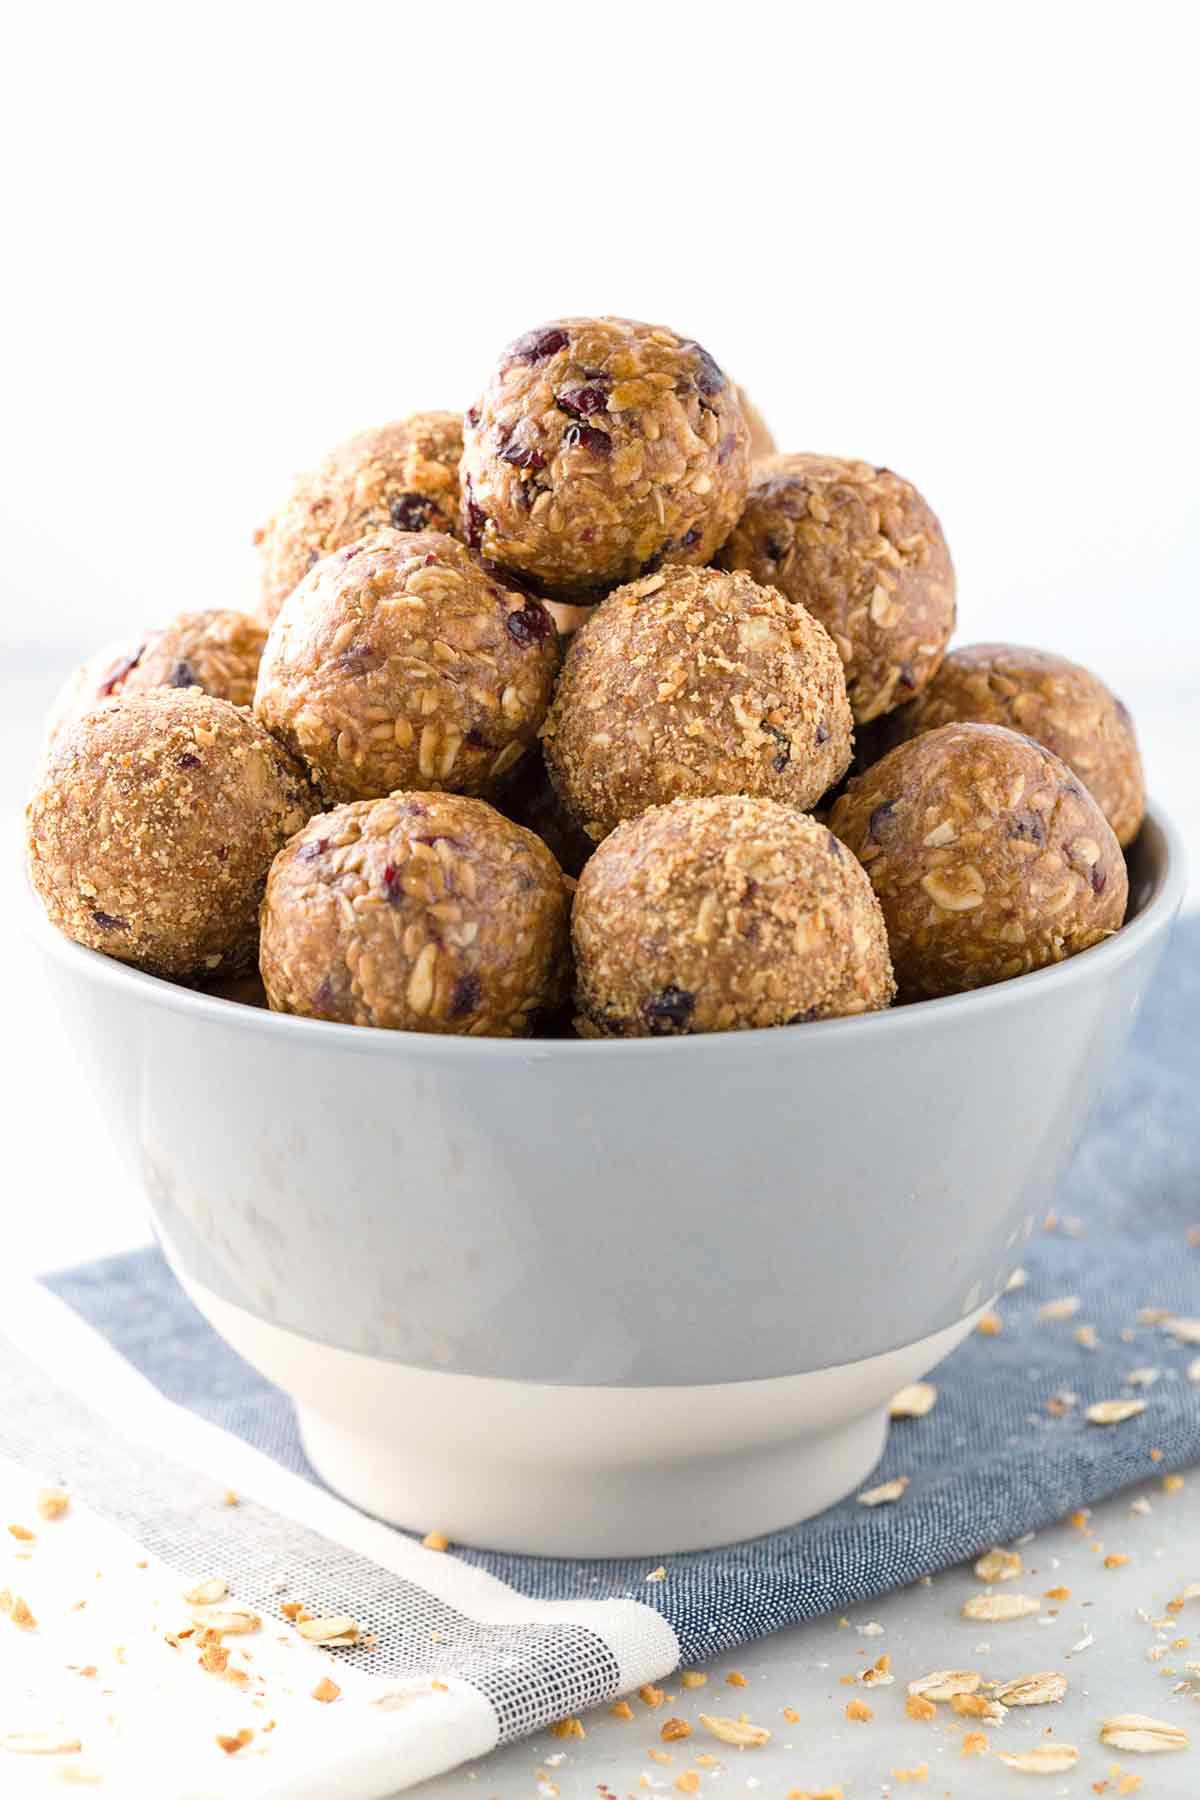 Bowl of healthy no bake energy bites